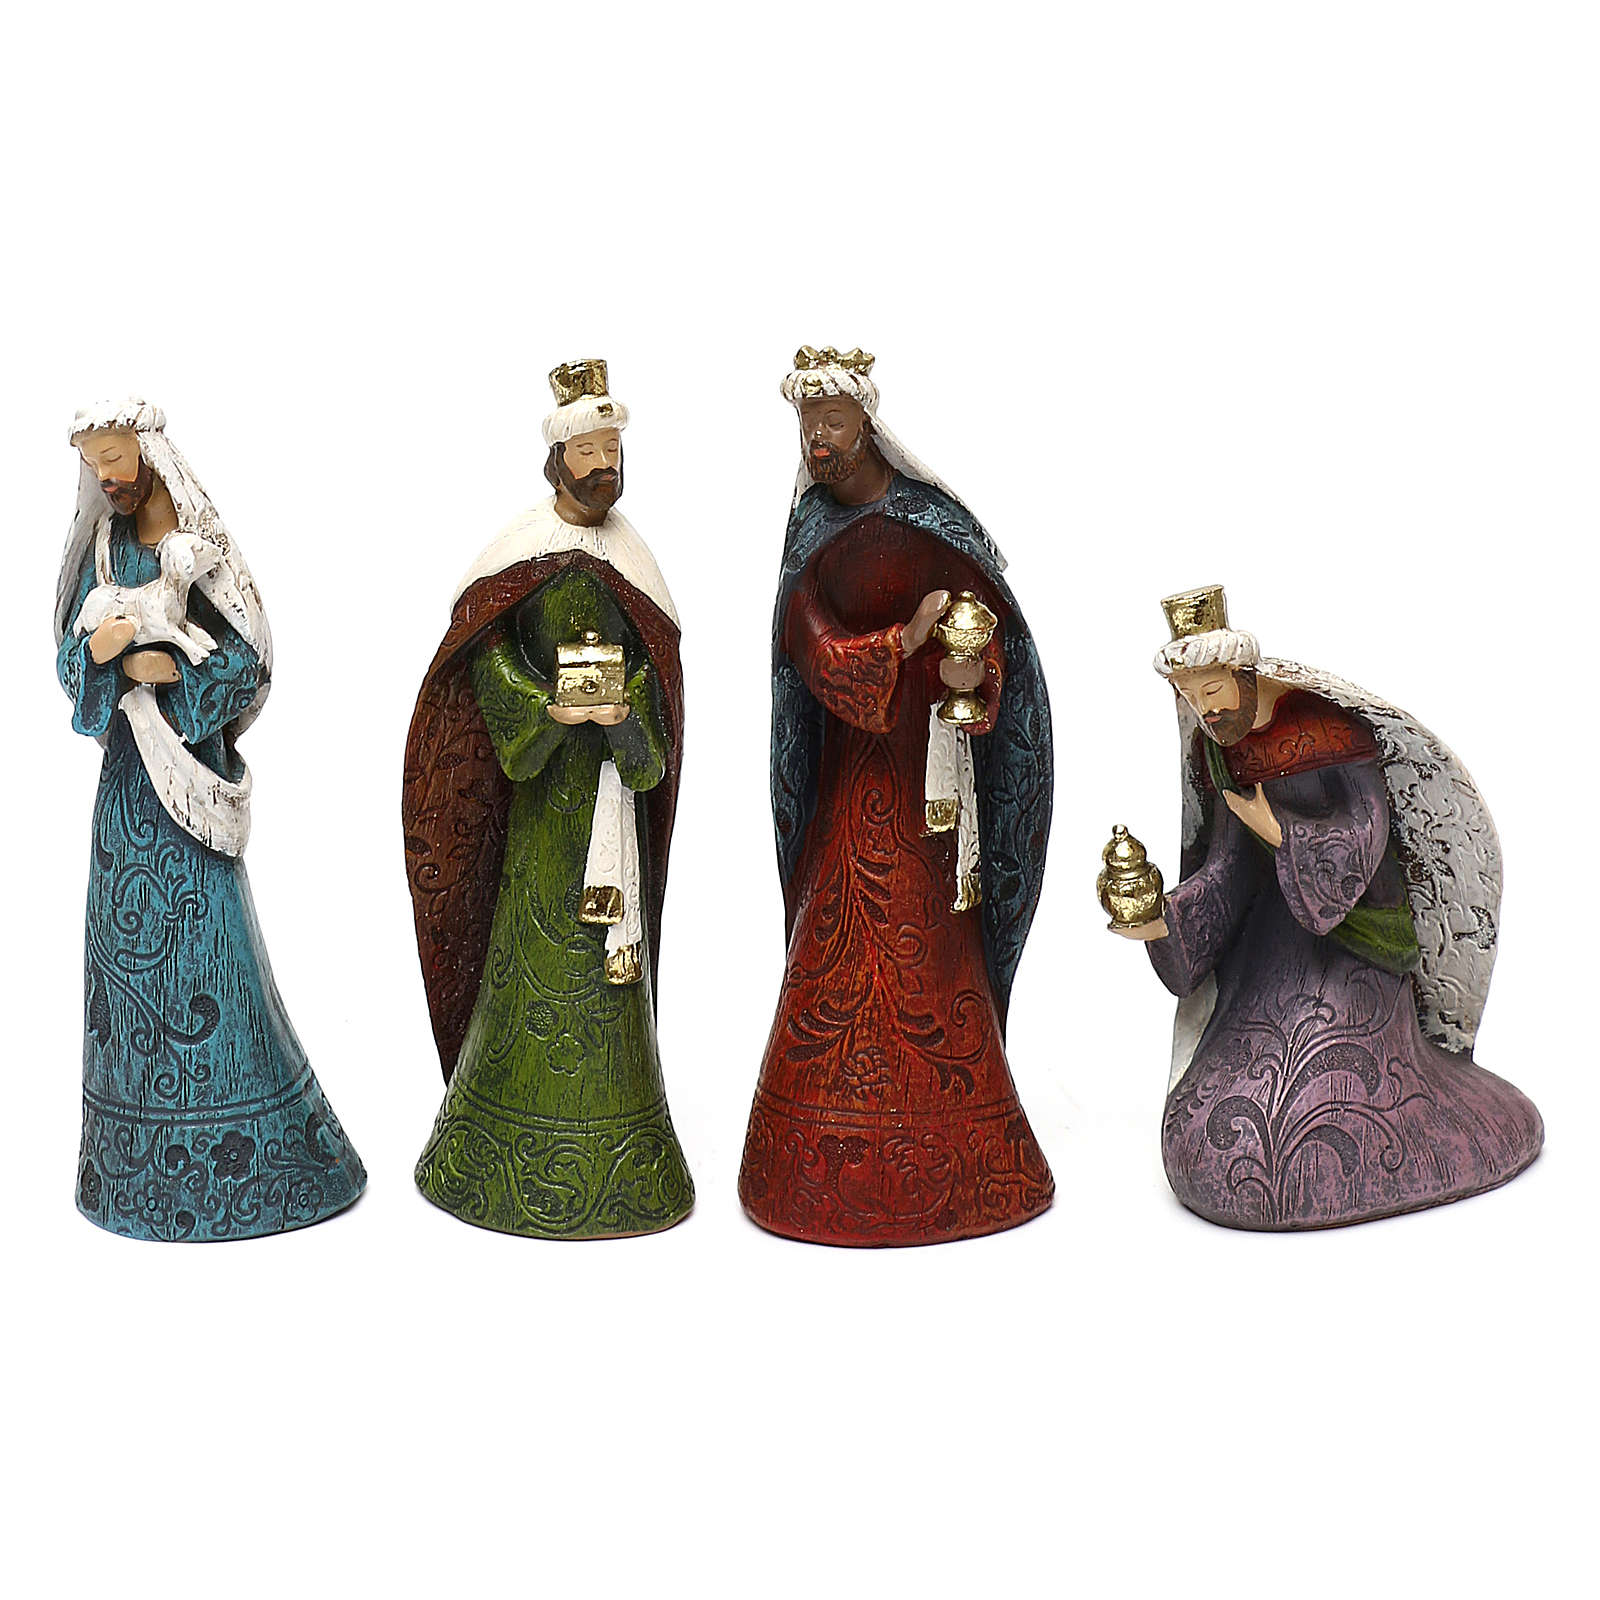 Nativity Scene 7 characters with hut 16 cm 4